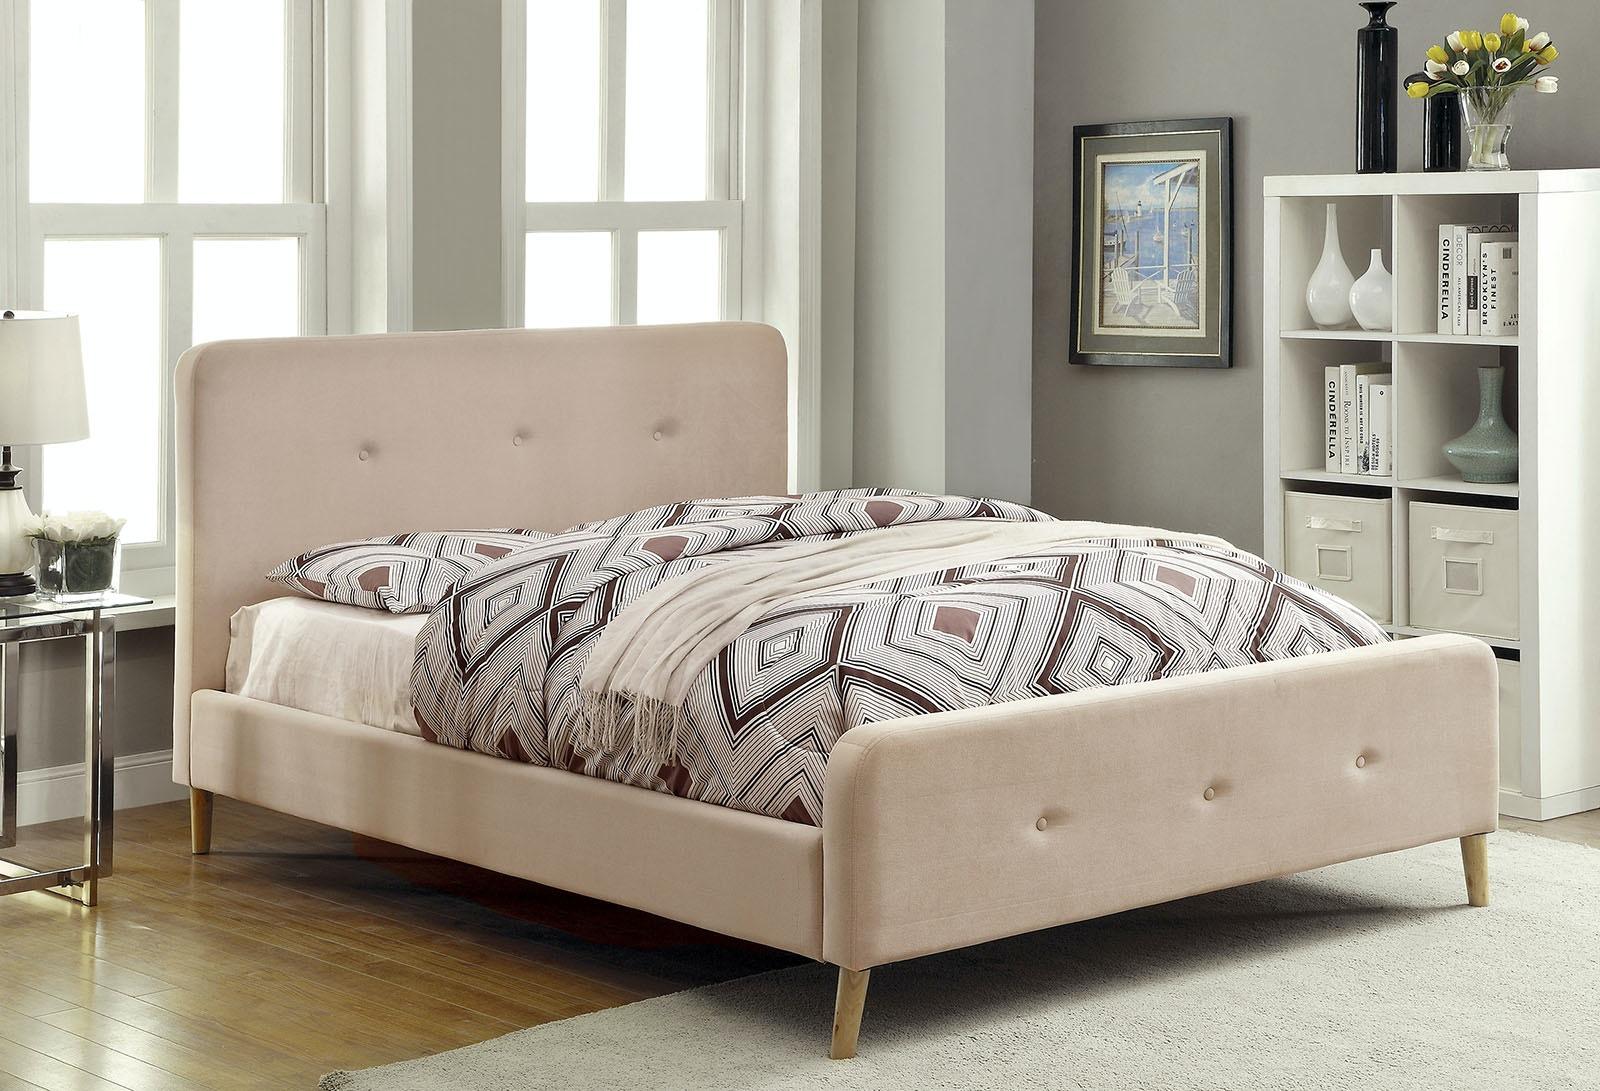 Furniture Of America Bedroom Twin Bed Headboard Footboard 13 Pc Slats Cm7272bg T Hbfb The